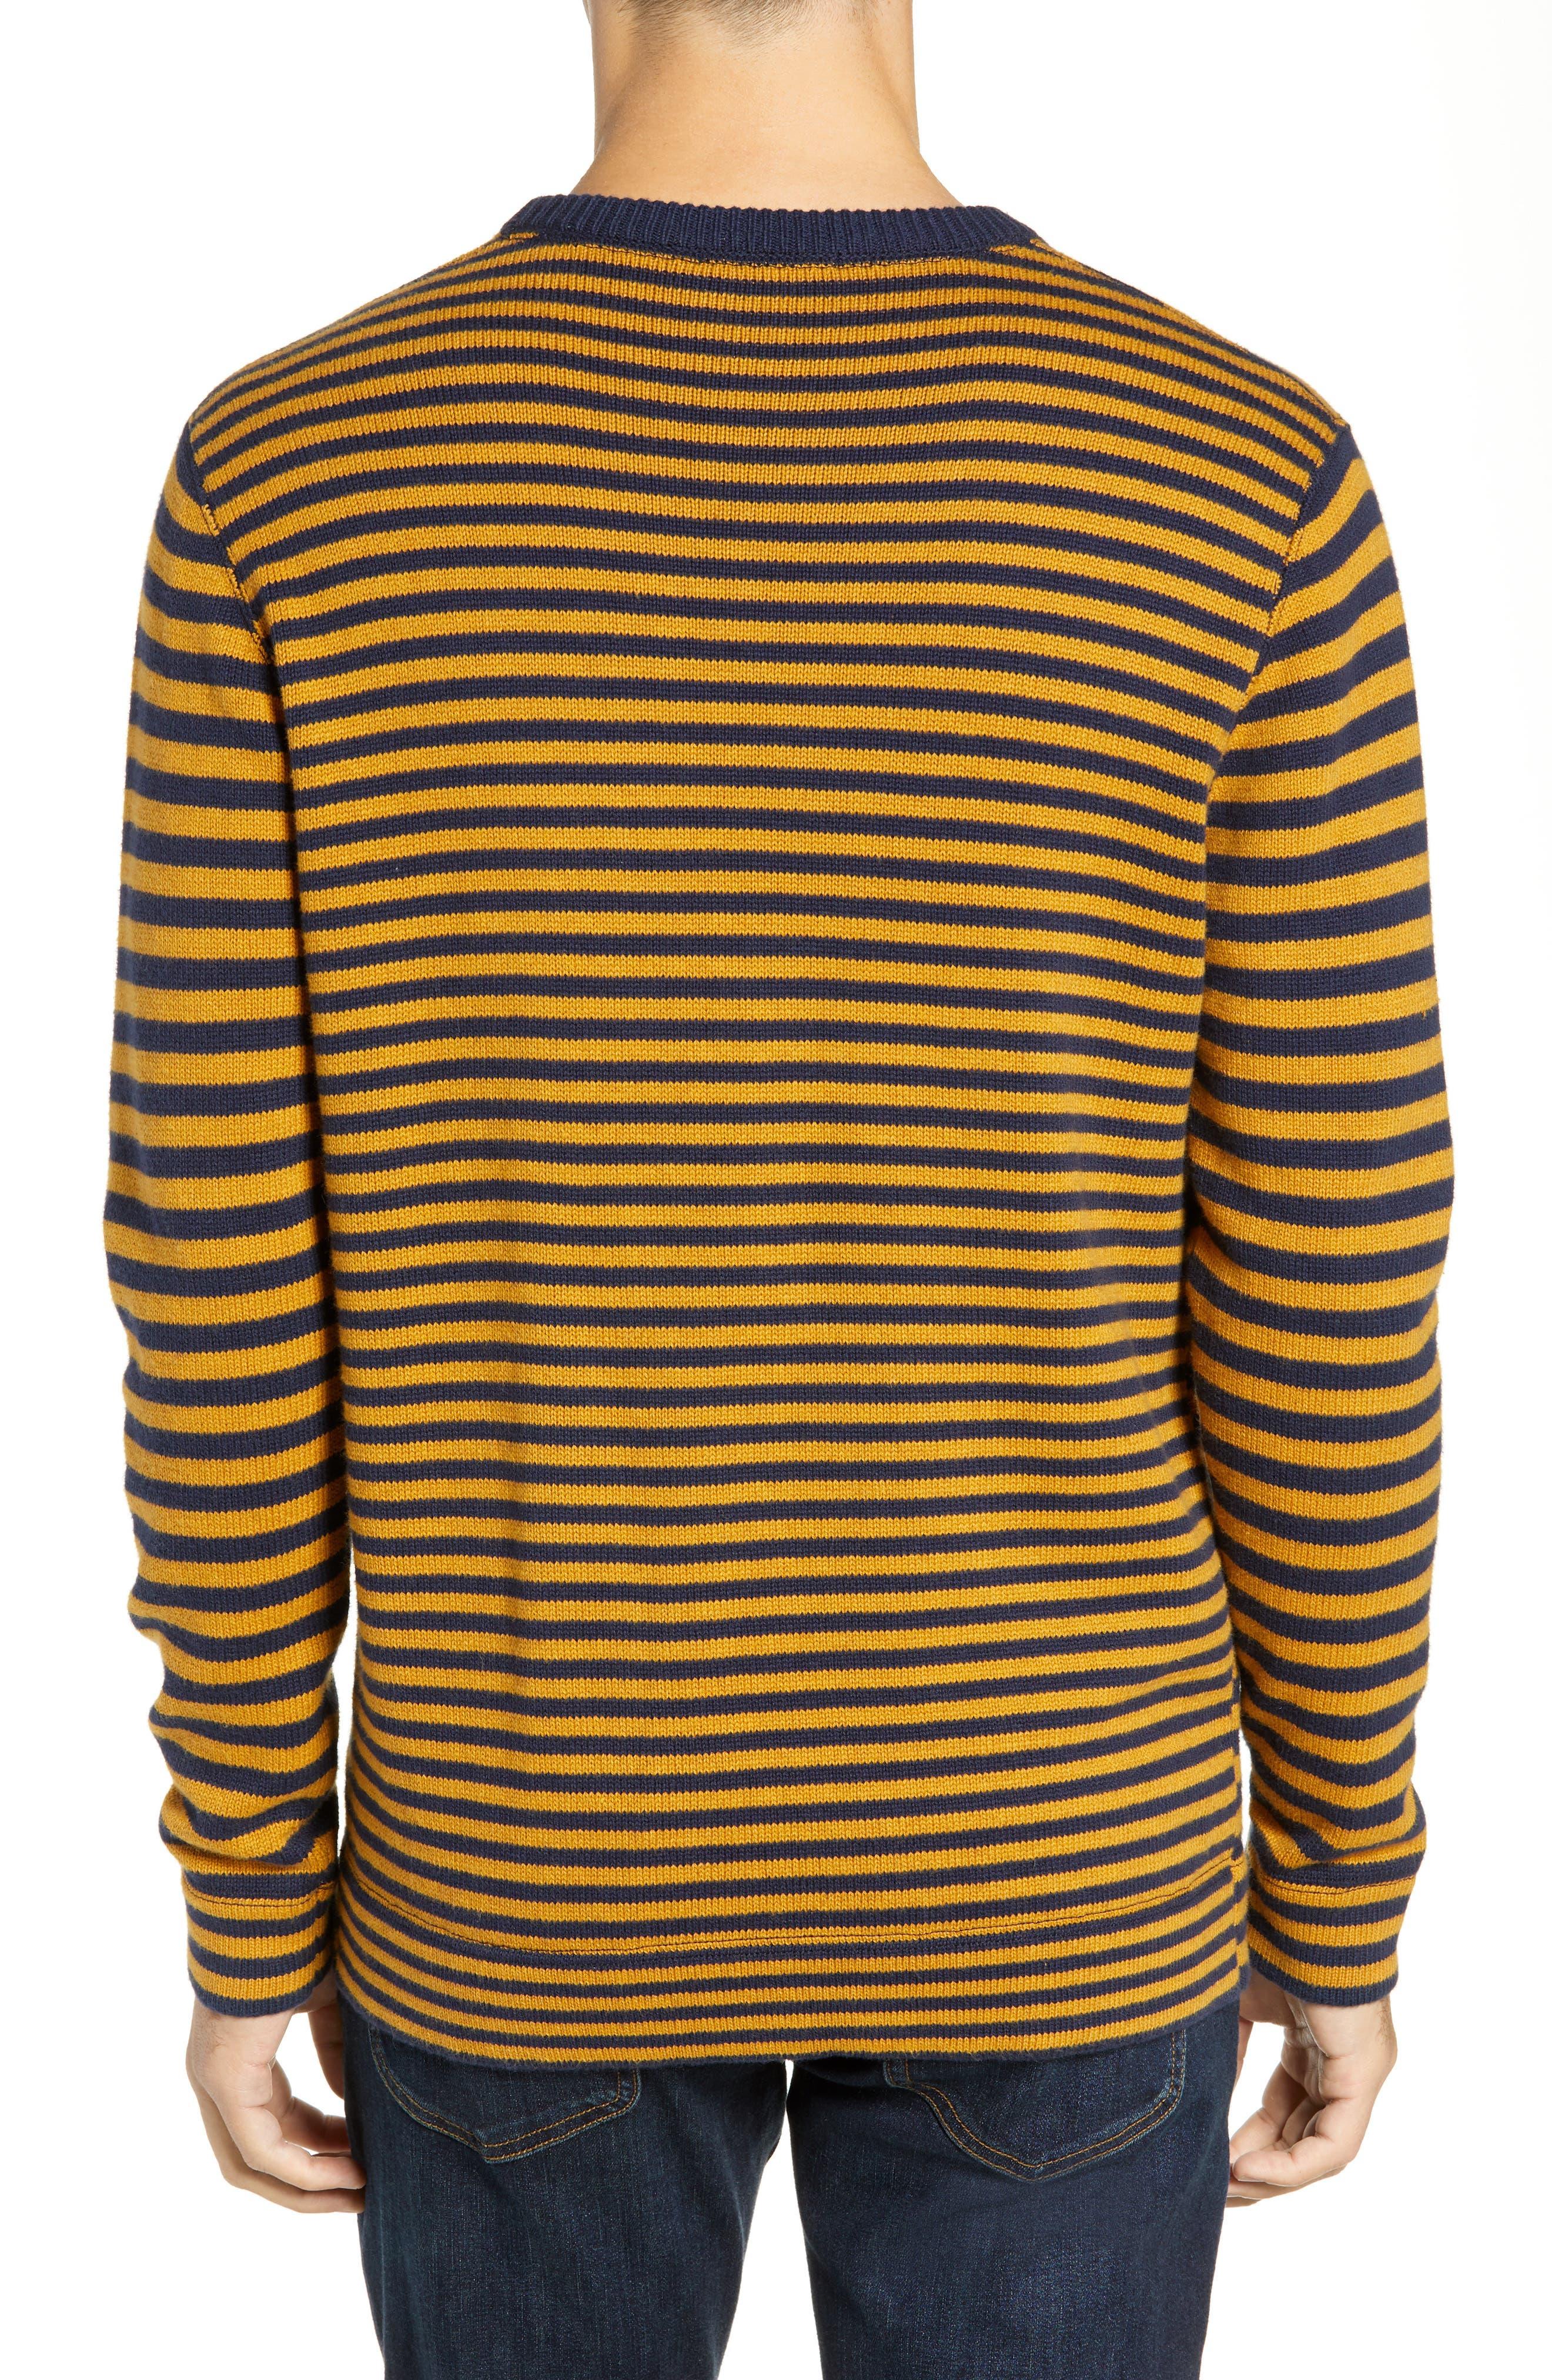 Stripe Cotton & Wool Sweater,                             Alternate thumbnail 2, color,                             CALLUNA YELLOW UTILITY BLUE